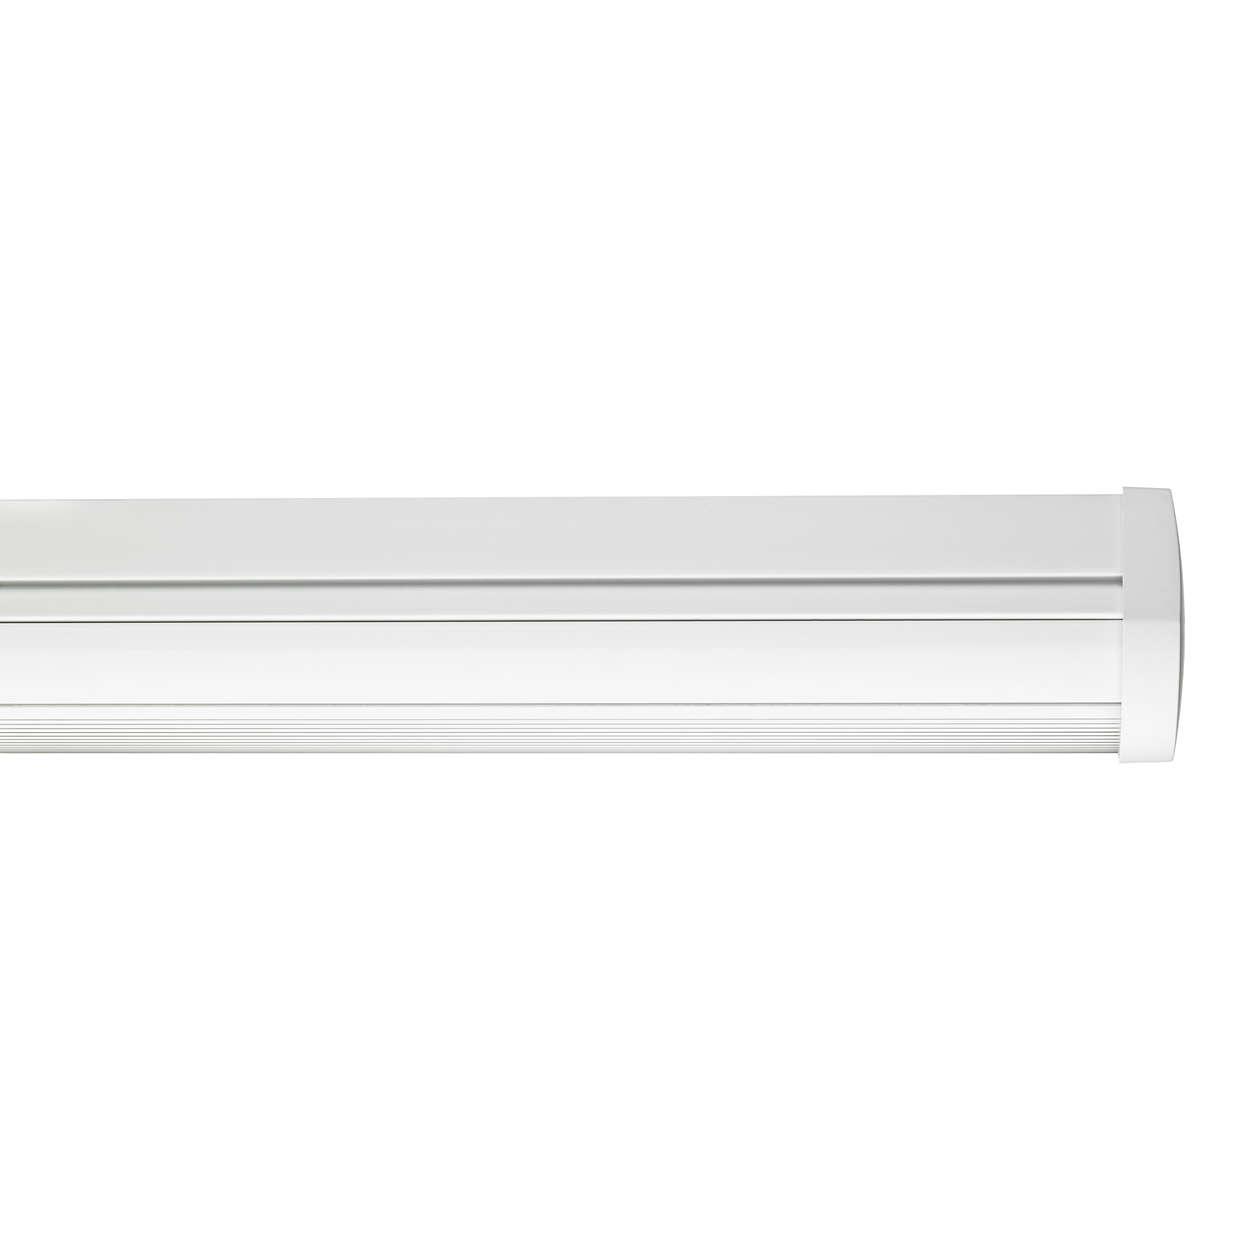 Maxos LED Performer 4MX900